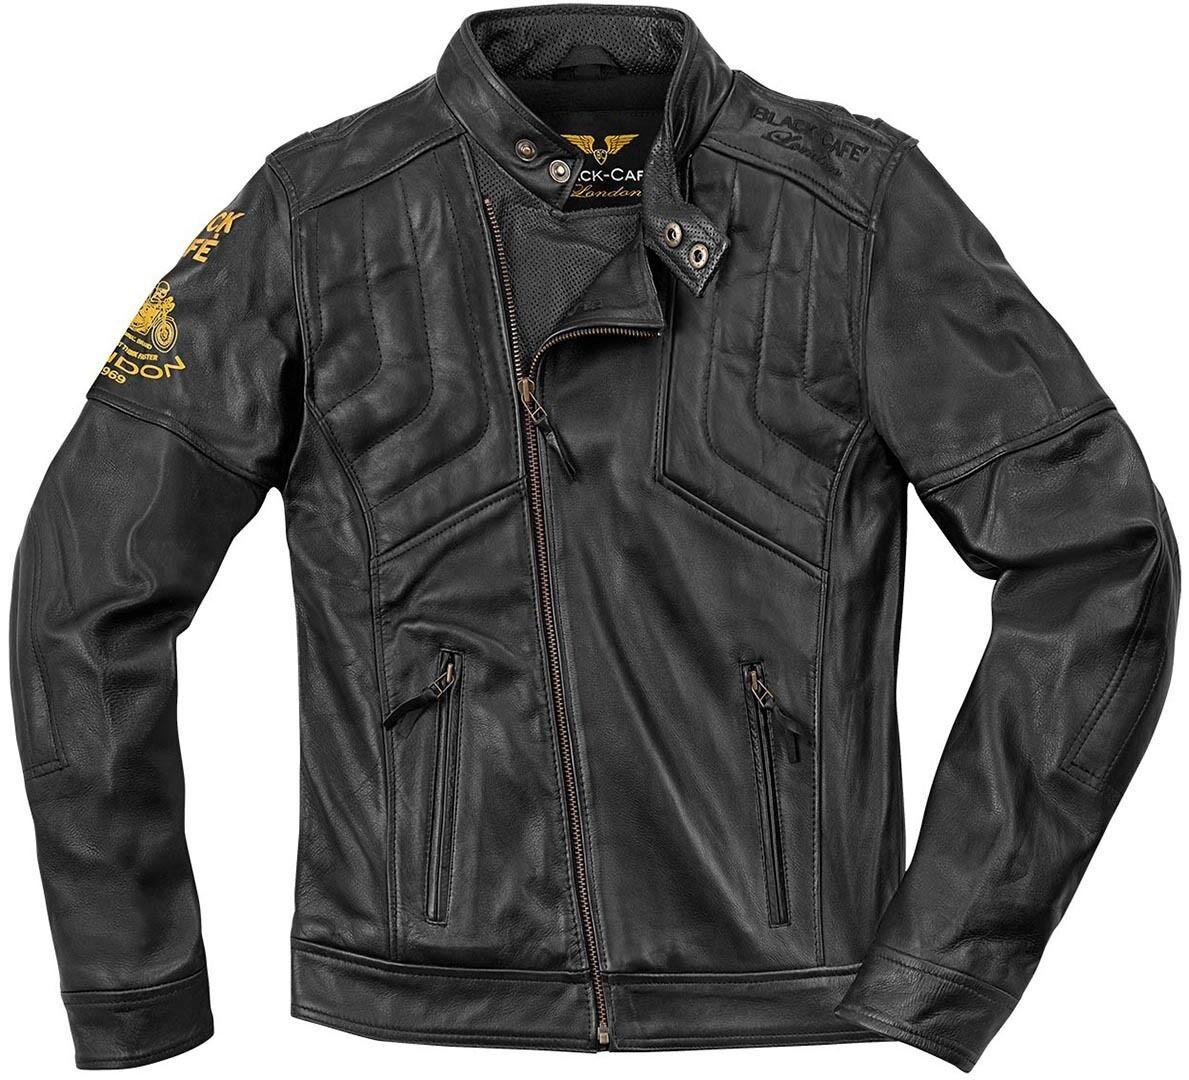 Black-Cafe London Sari Veste de moto en cuir Noir taille : 48